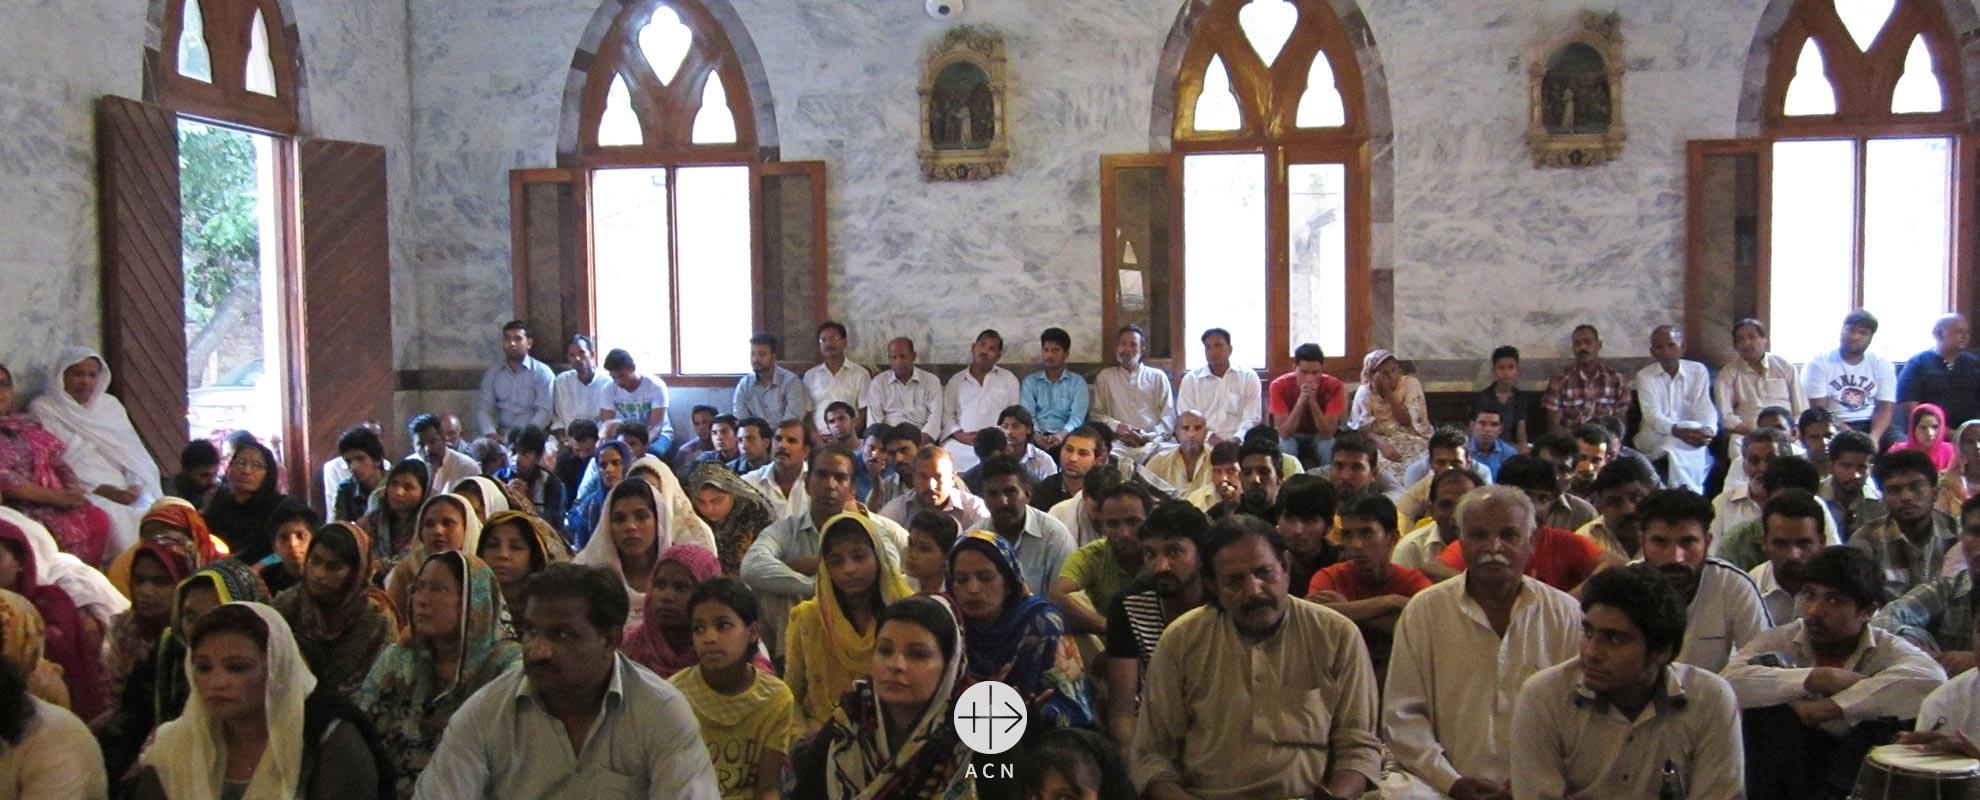 Brave security prevented a massacre at Quetta church